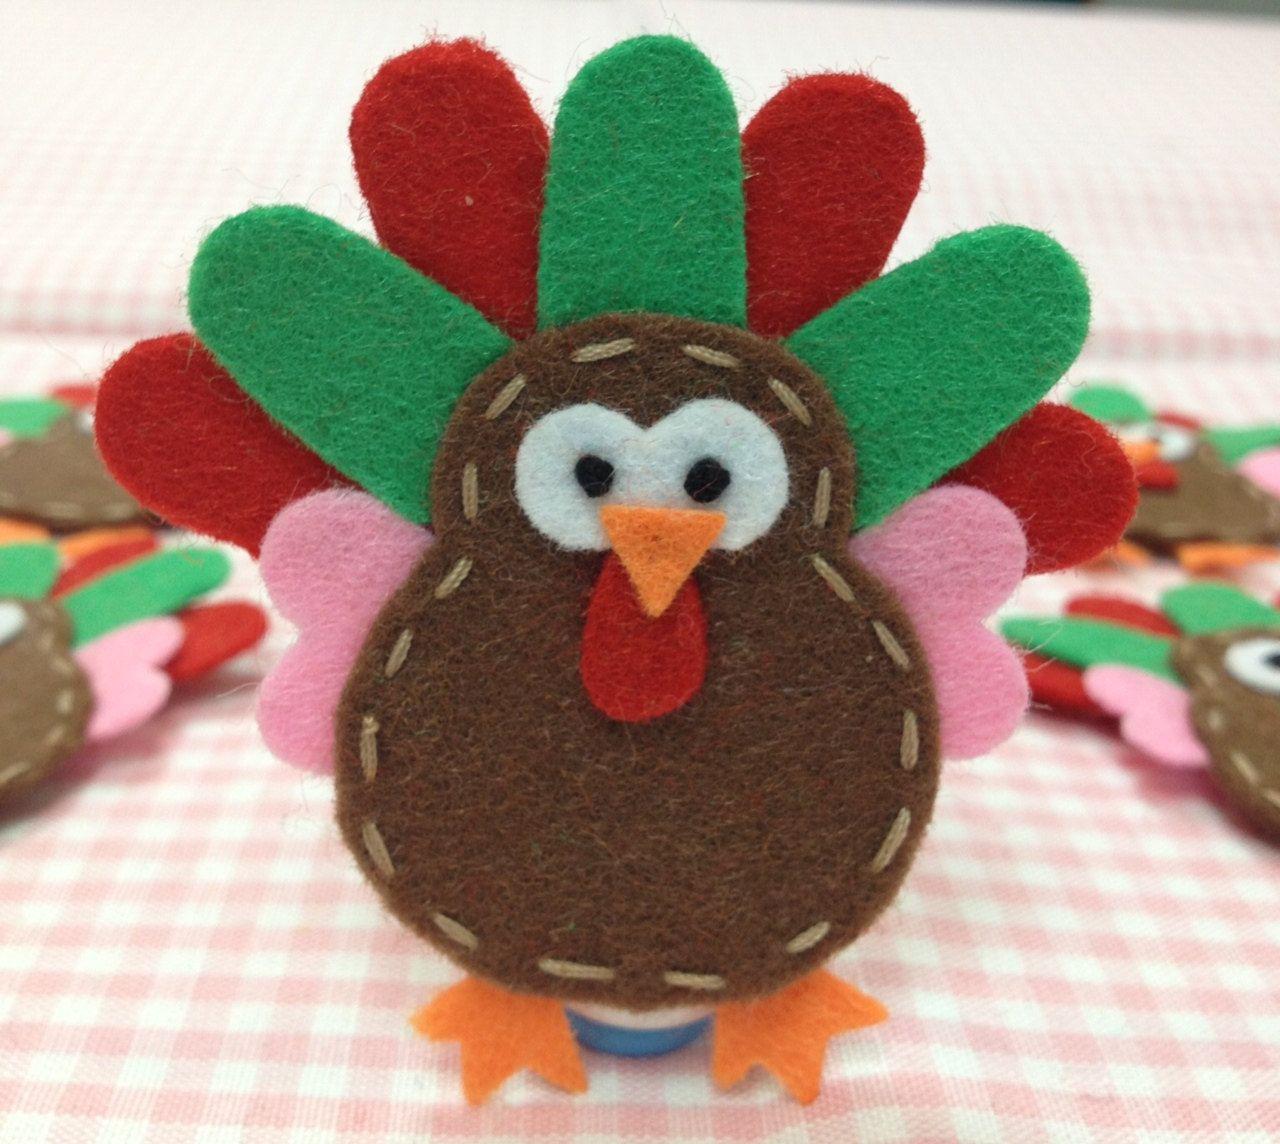 Felt Turkey Fun Thanksgiving Arts And Crafts Handmade Felt Felt Ornaments